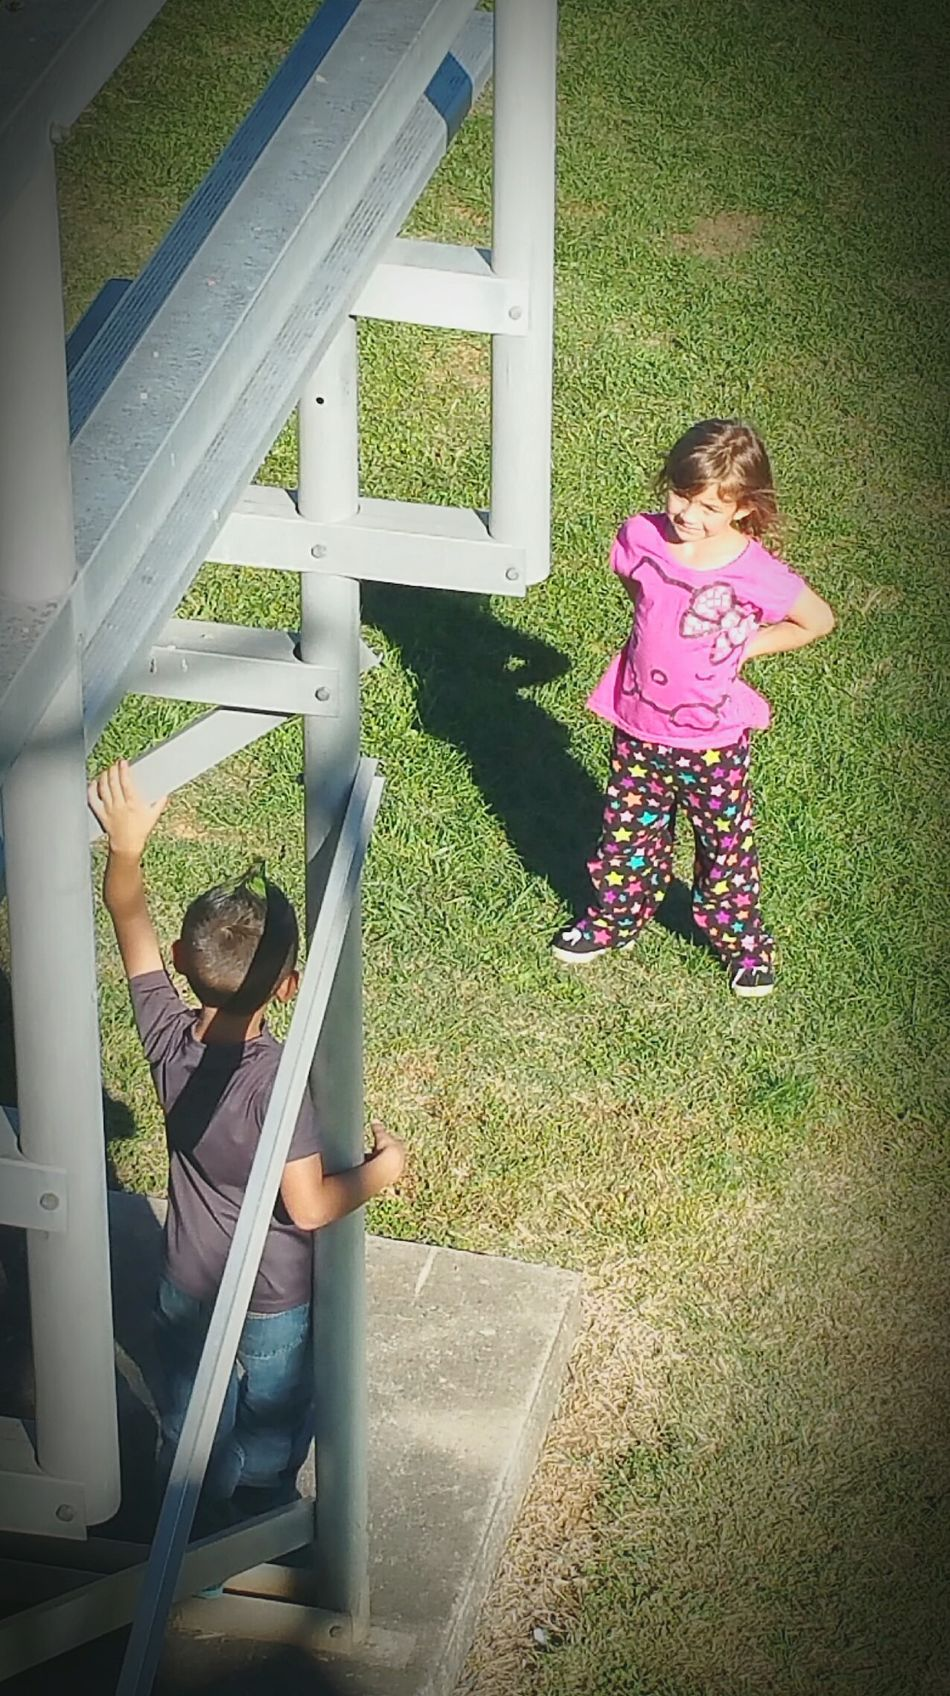 Girl Meets Boy First Love Josie ❤ Playing Kids Being Kids